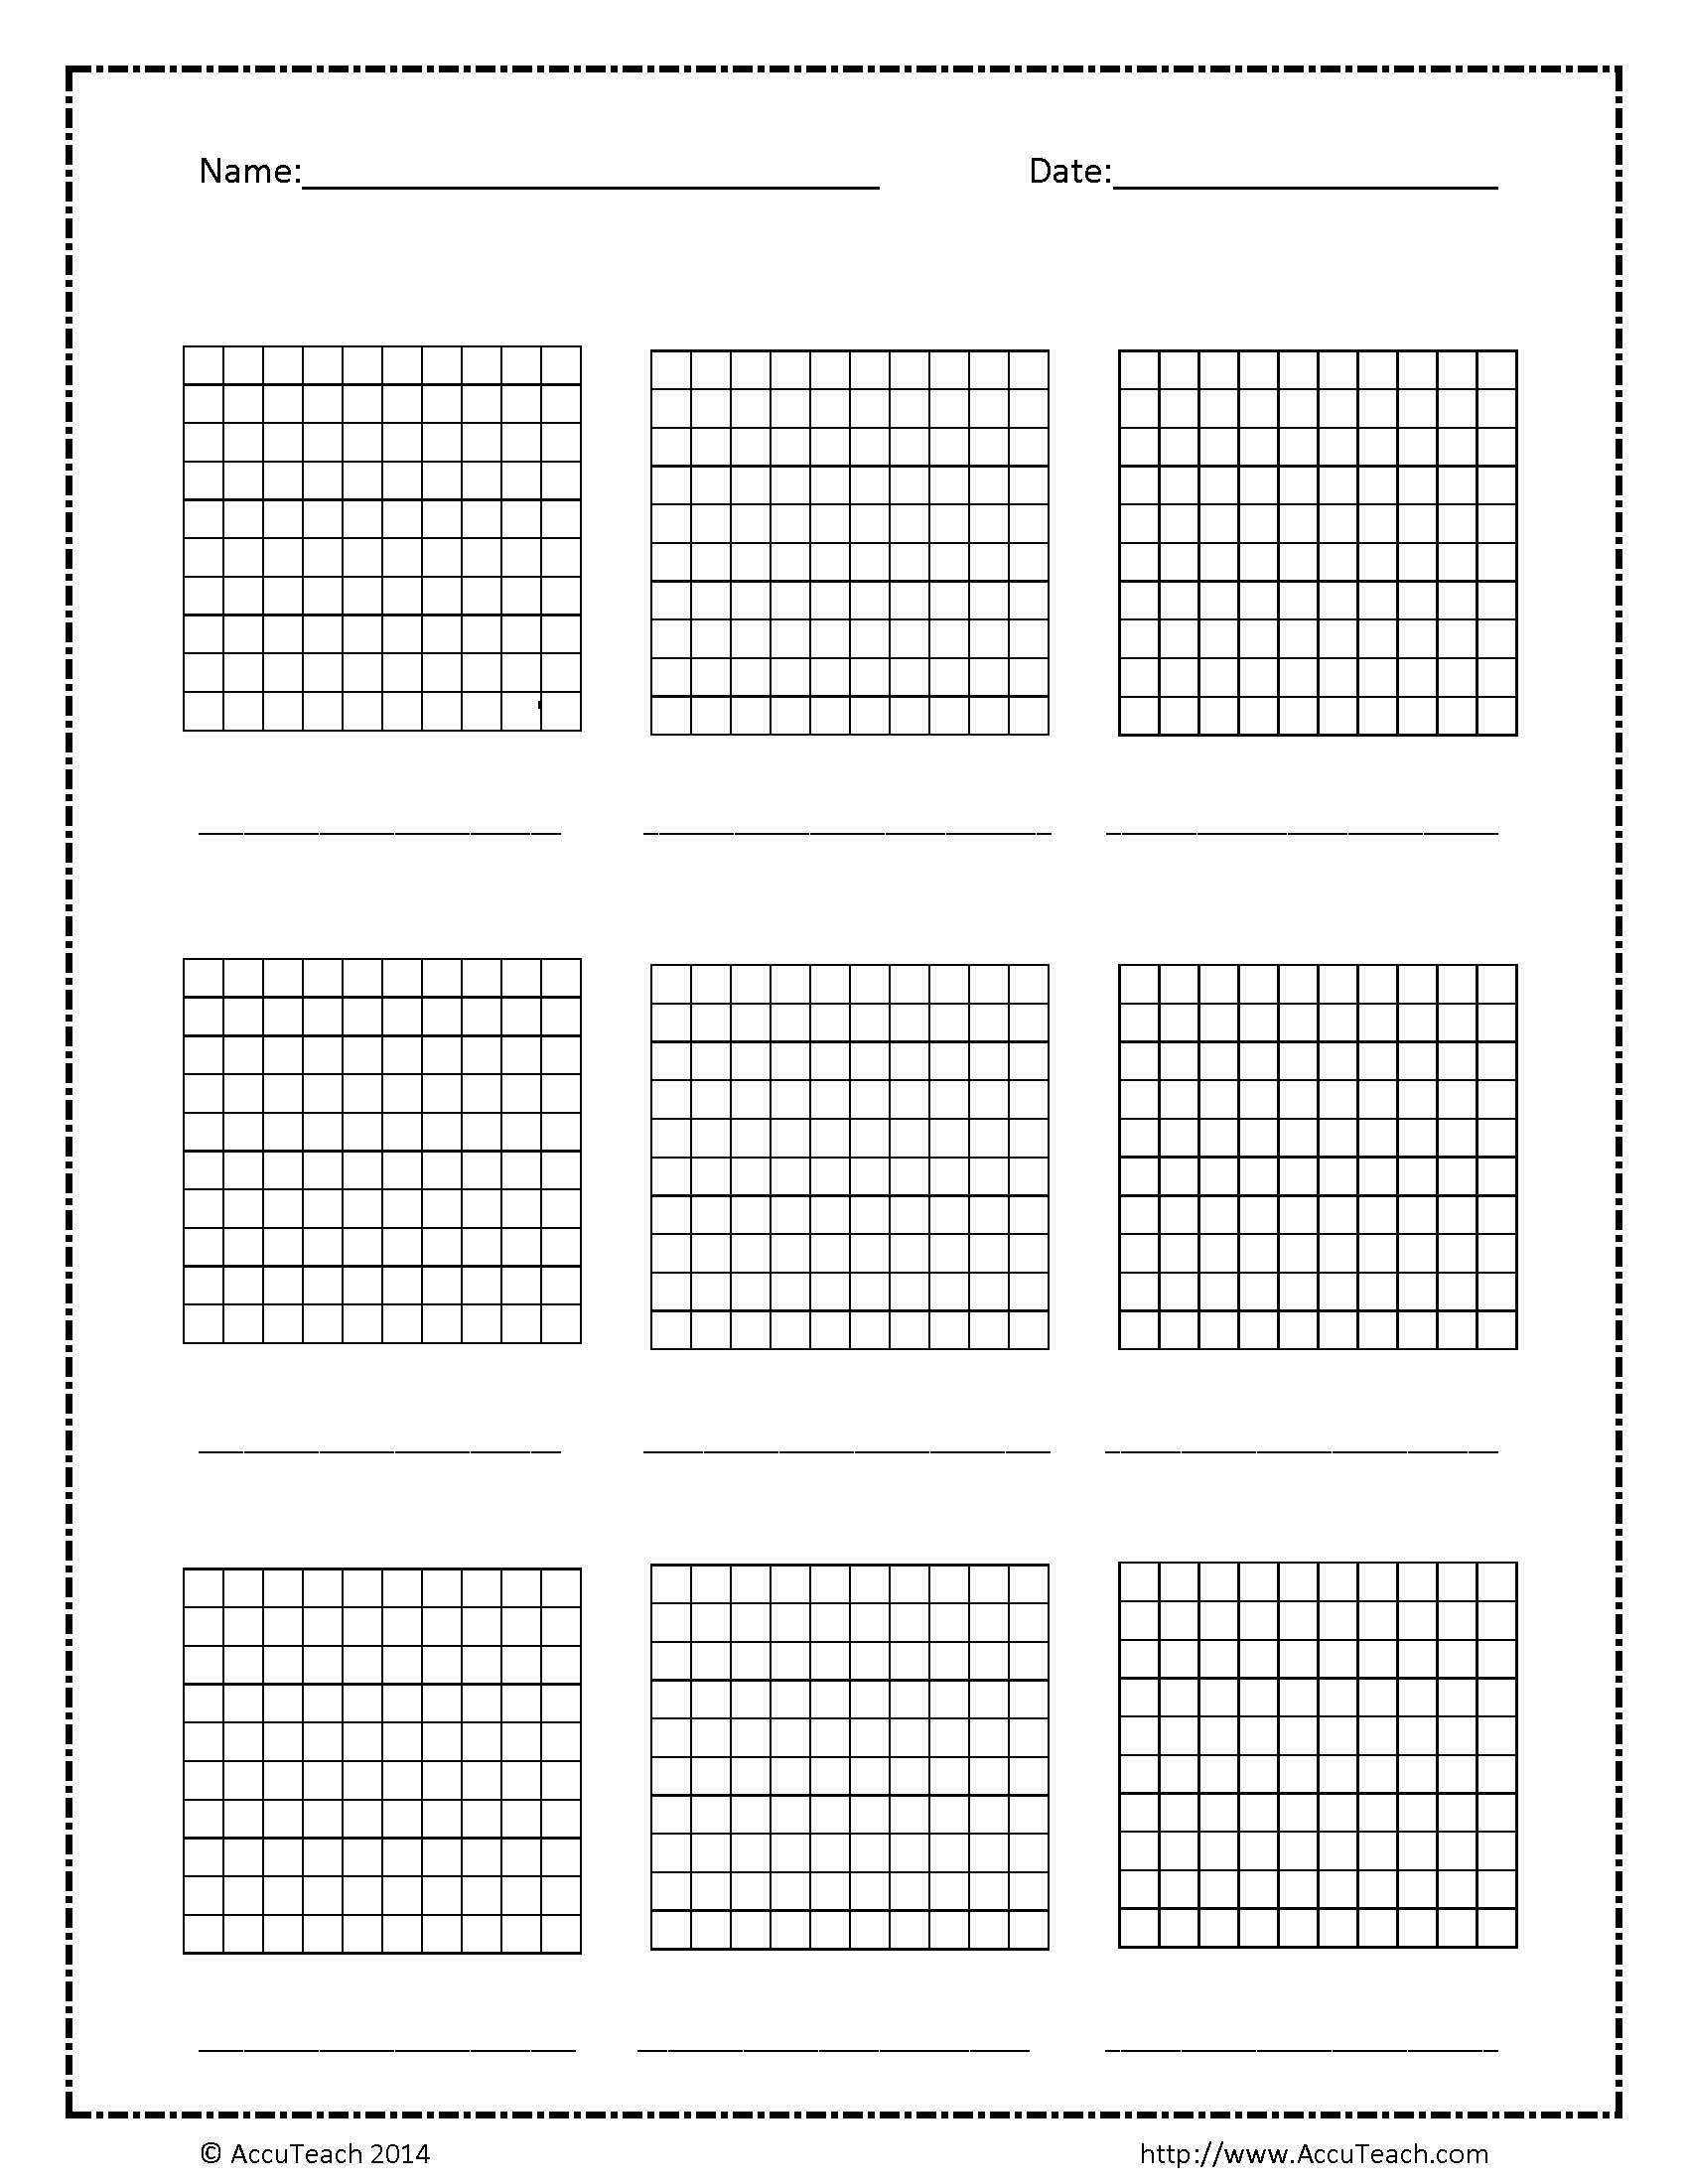 hight resolution of Blank Base Ten Hundreds Frame PDF - AccuTeach